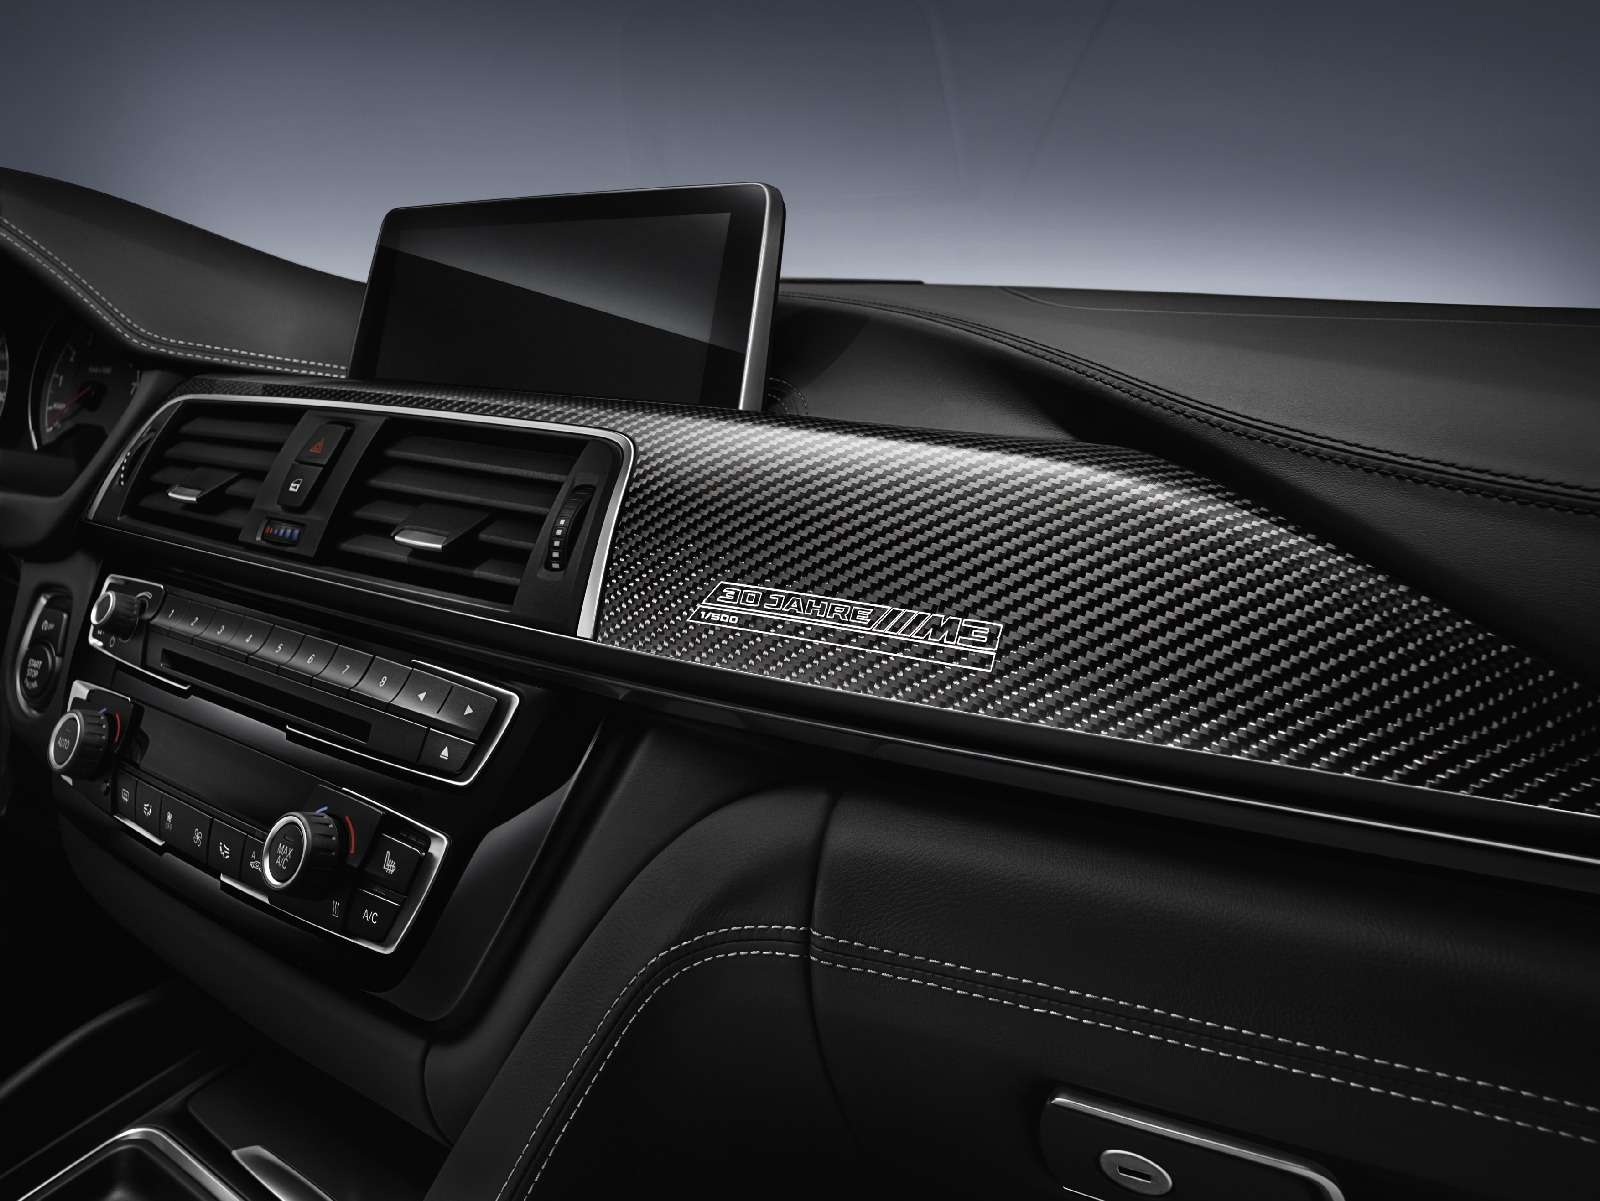 BMWM3отпразднует 30-летний юбилей с«лишними» дверьми— фото 593123